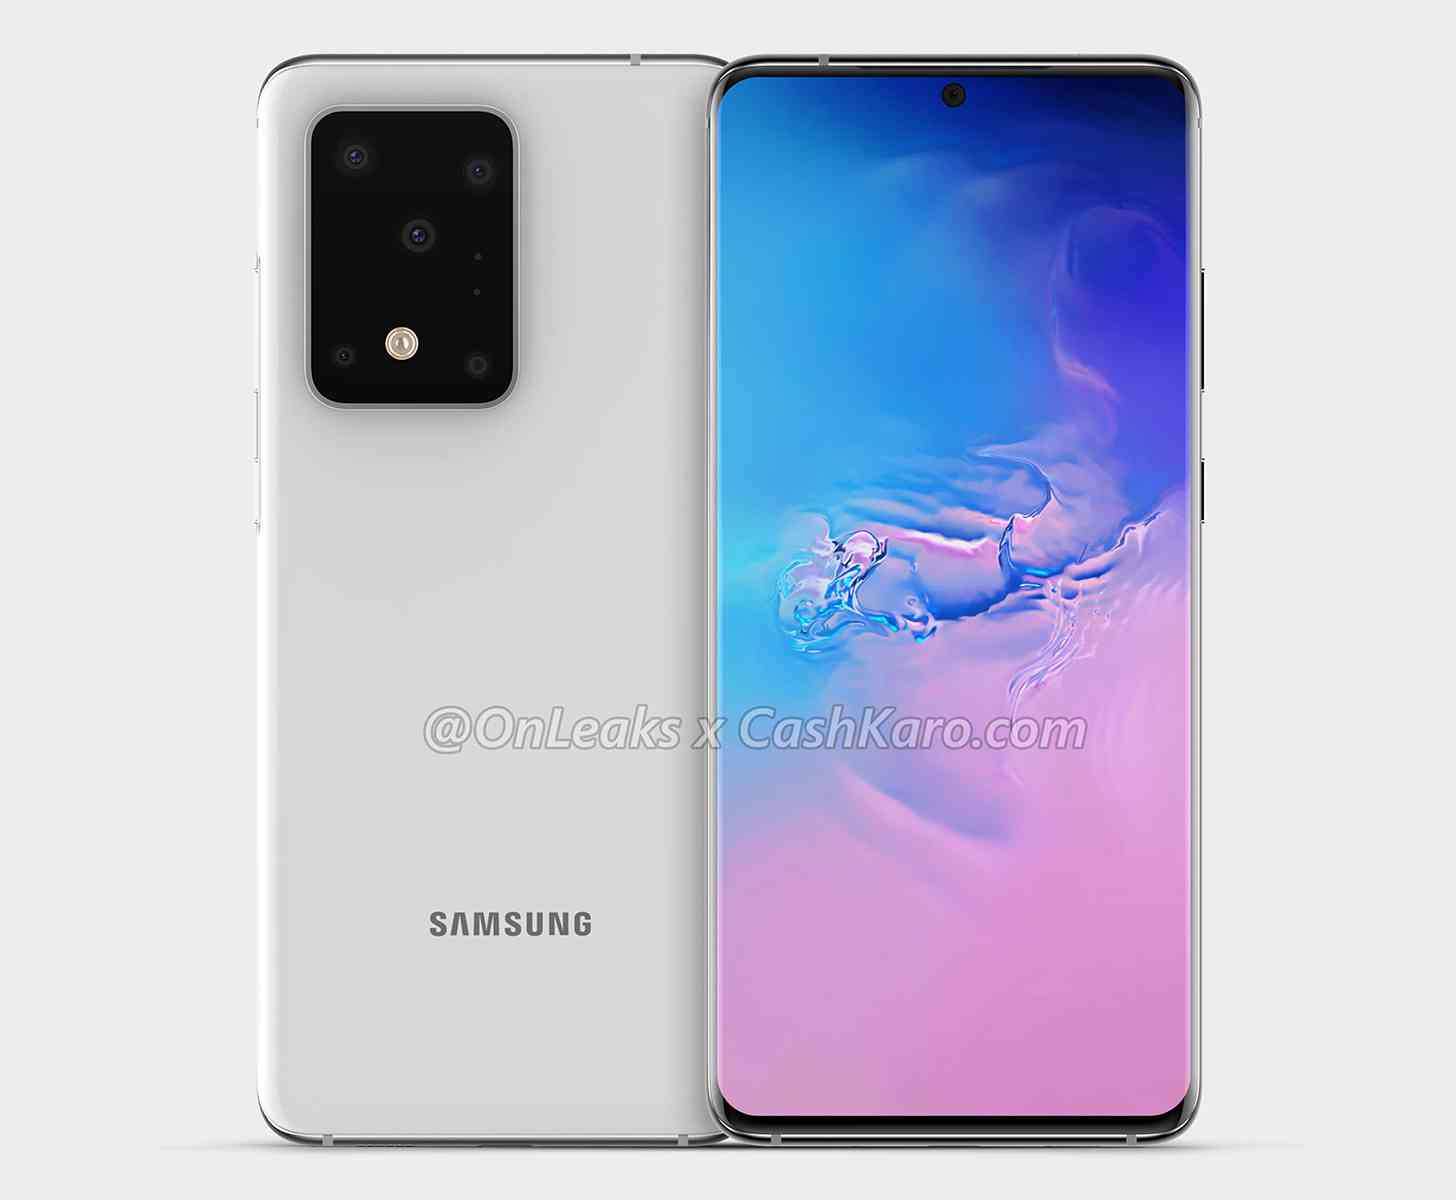 Samsung Galaxy S11+ renders